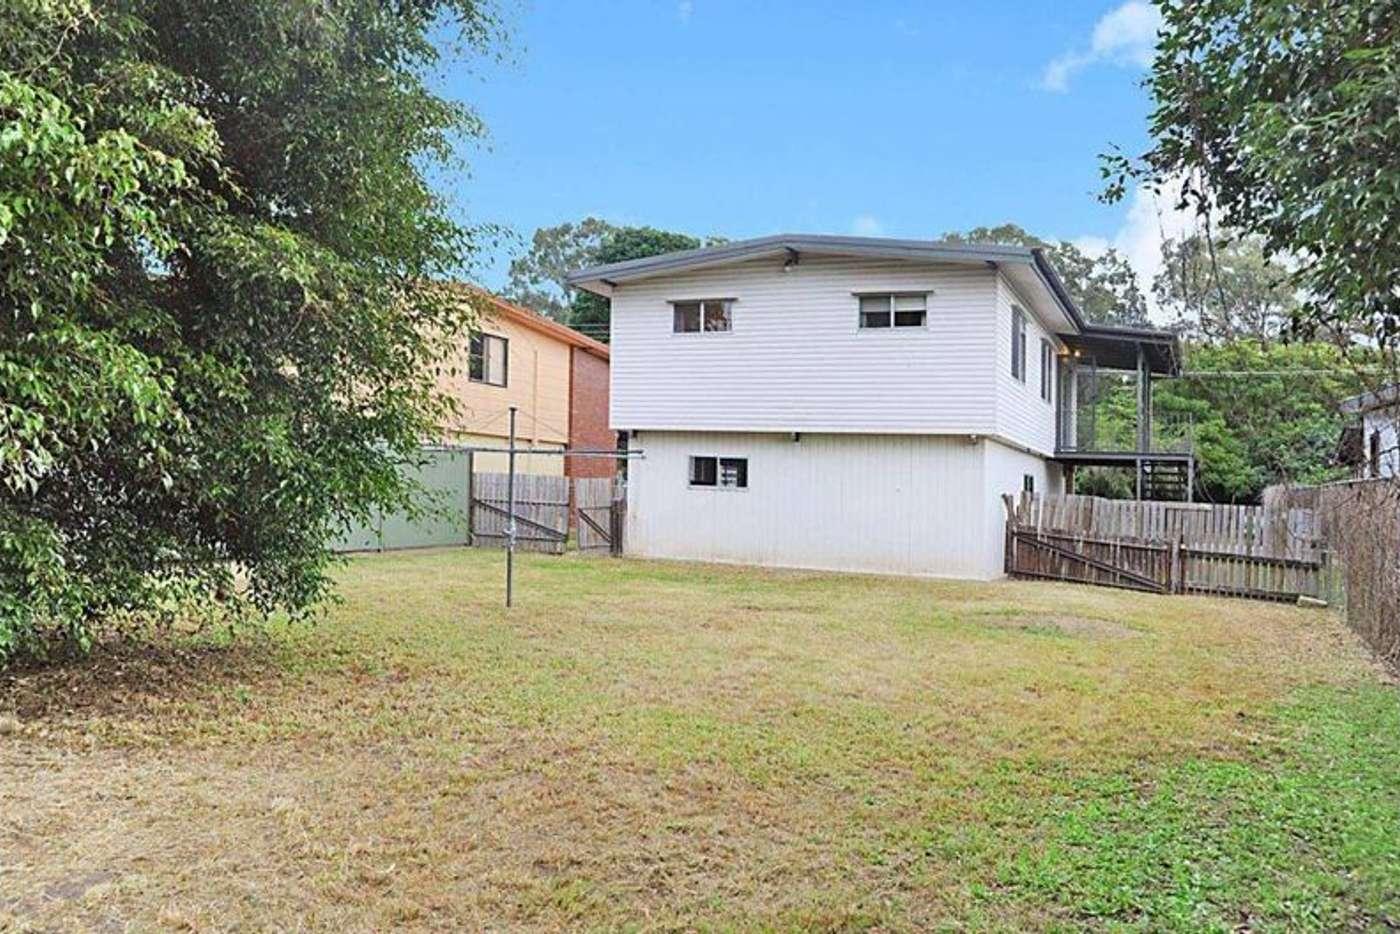 Seventh view of Homely house listing, 112 Spitfire Av, Strathpine QLD 4500